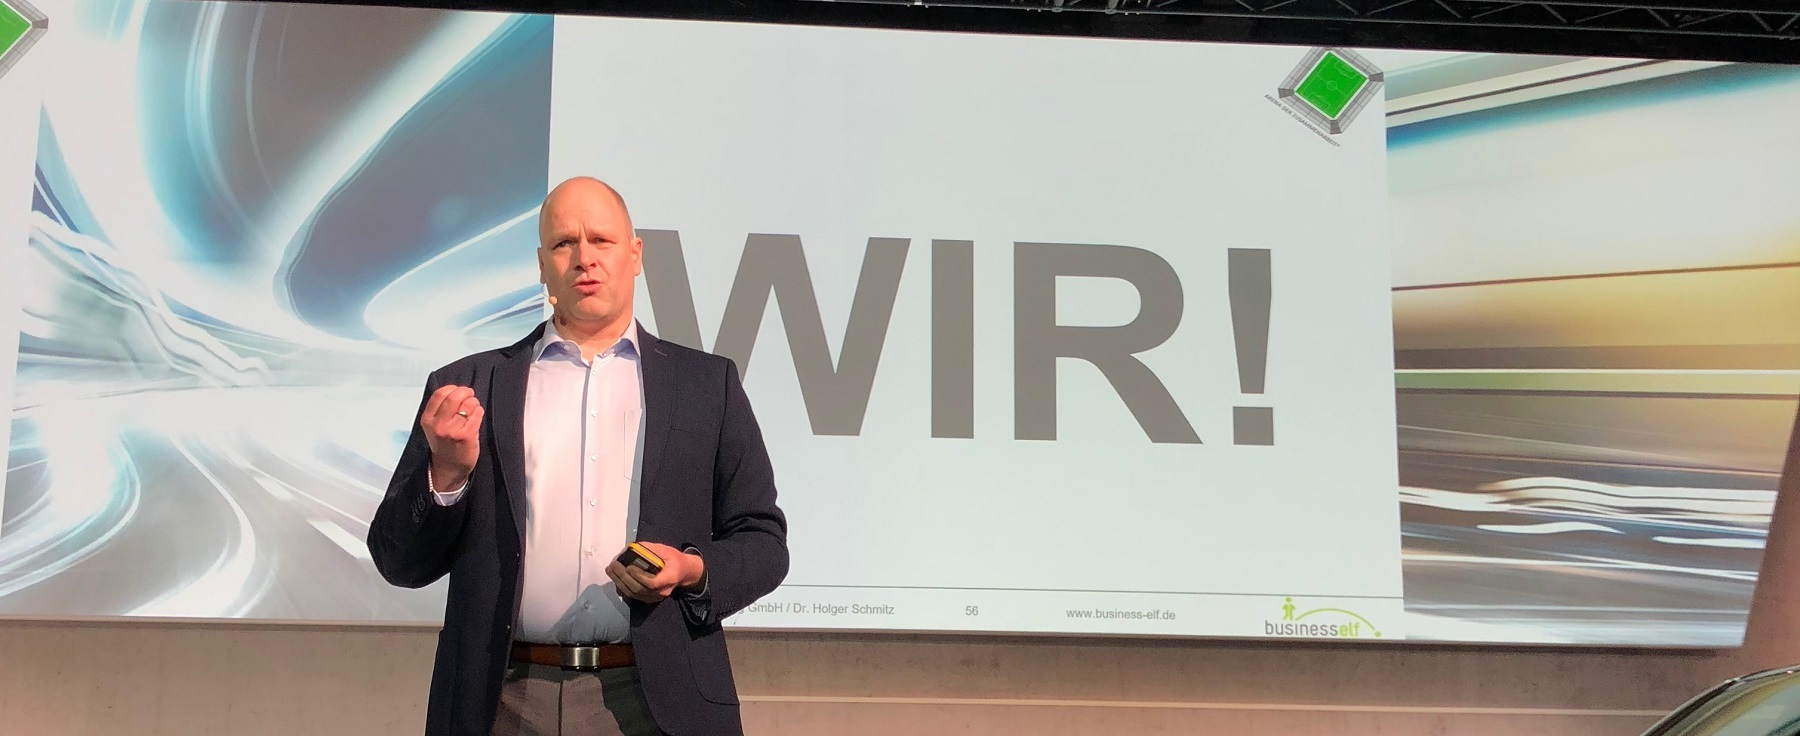 Leadership Experte und keynote speaker Dr. Holger Schmitz